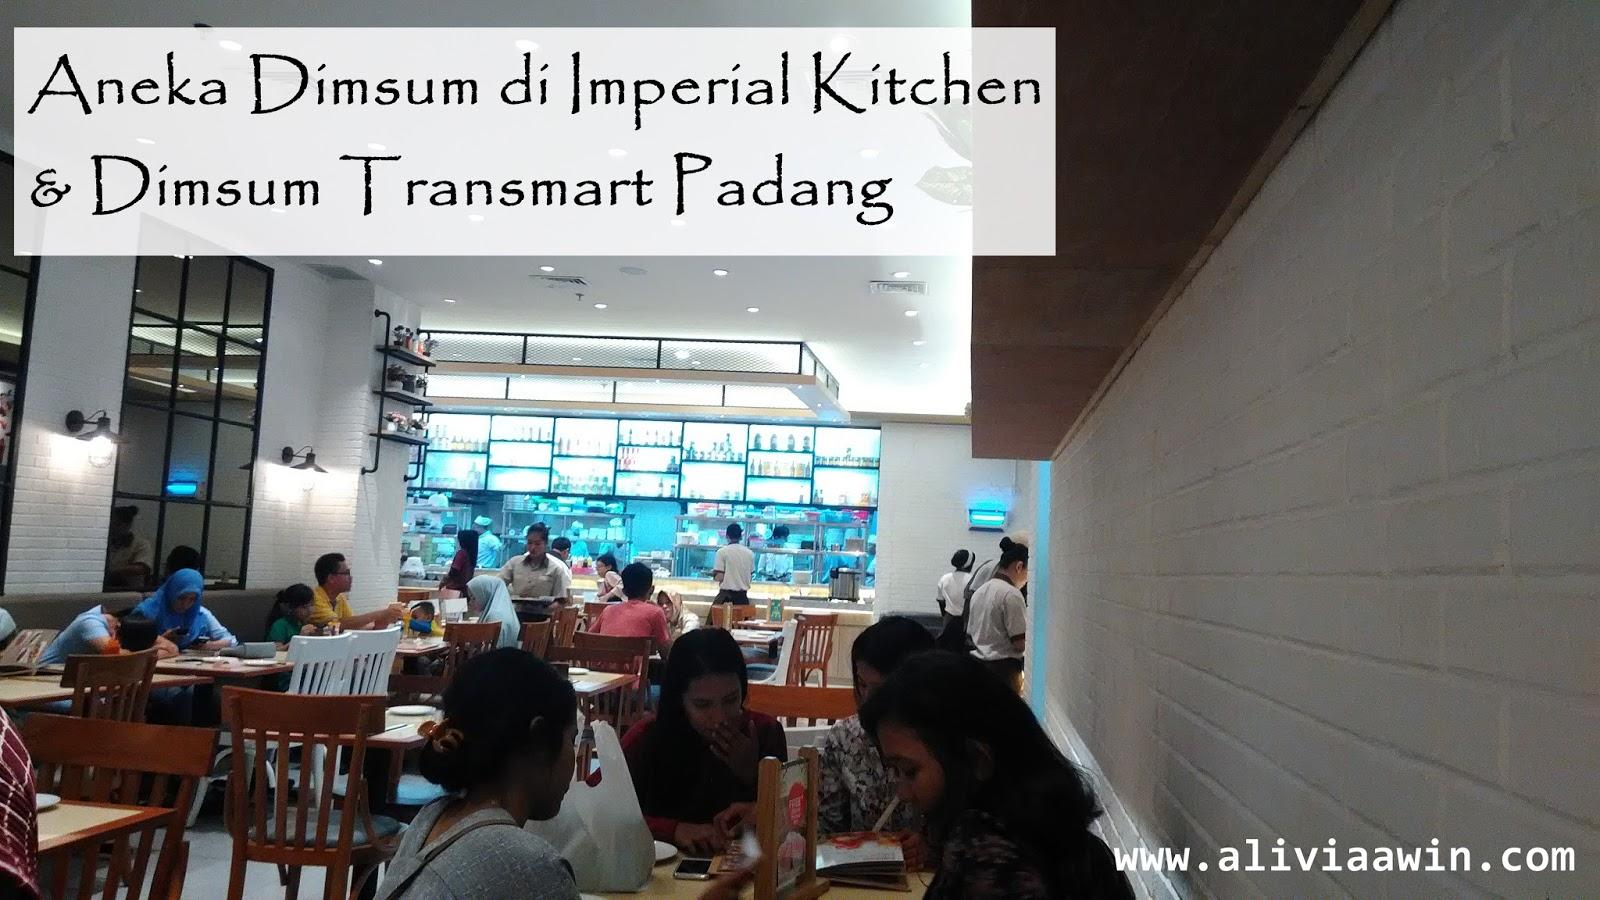 CIP ICIP] Aneka Dimsum di Imperial Kitchen & Dimsum Transmart Padang ...